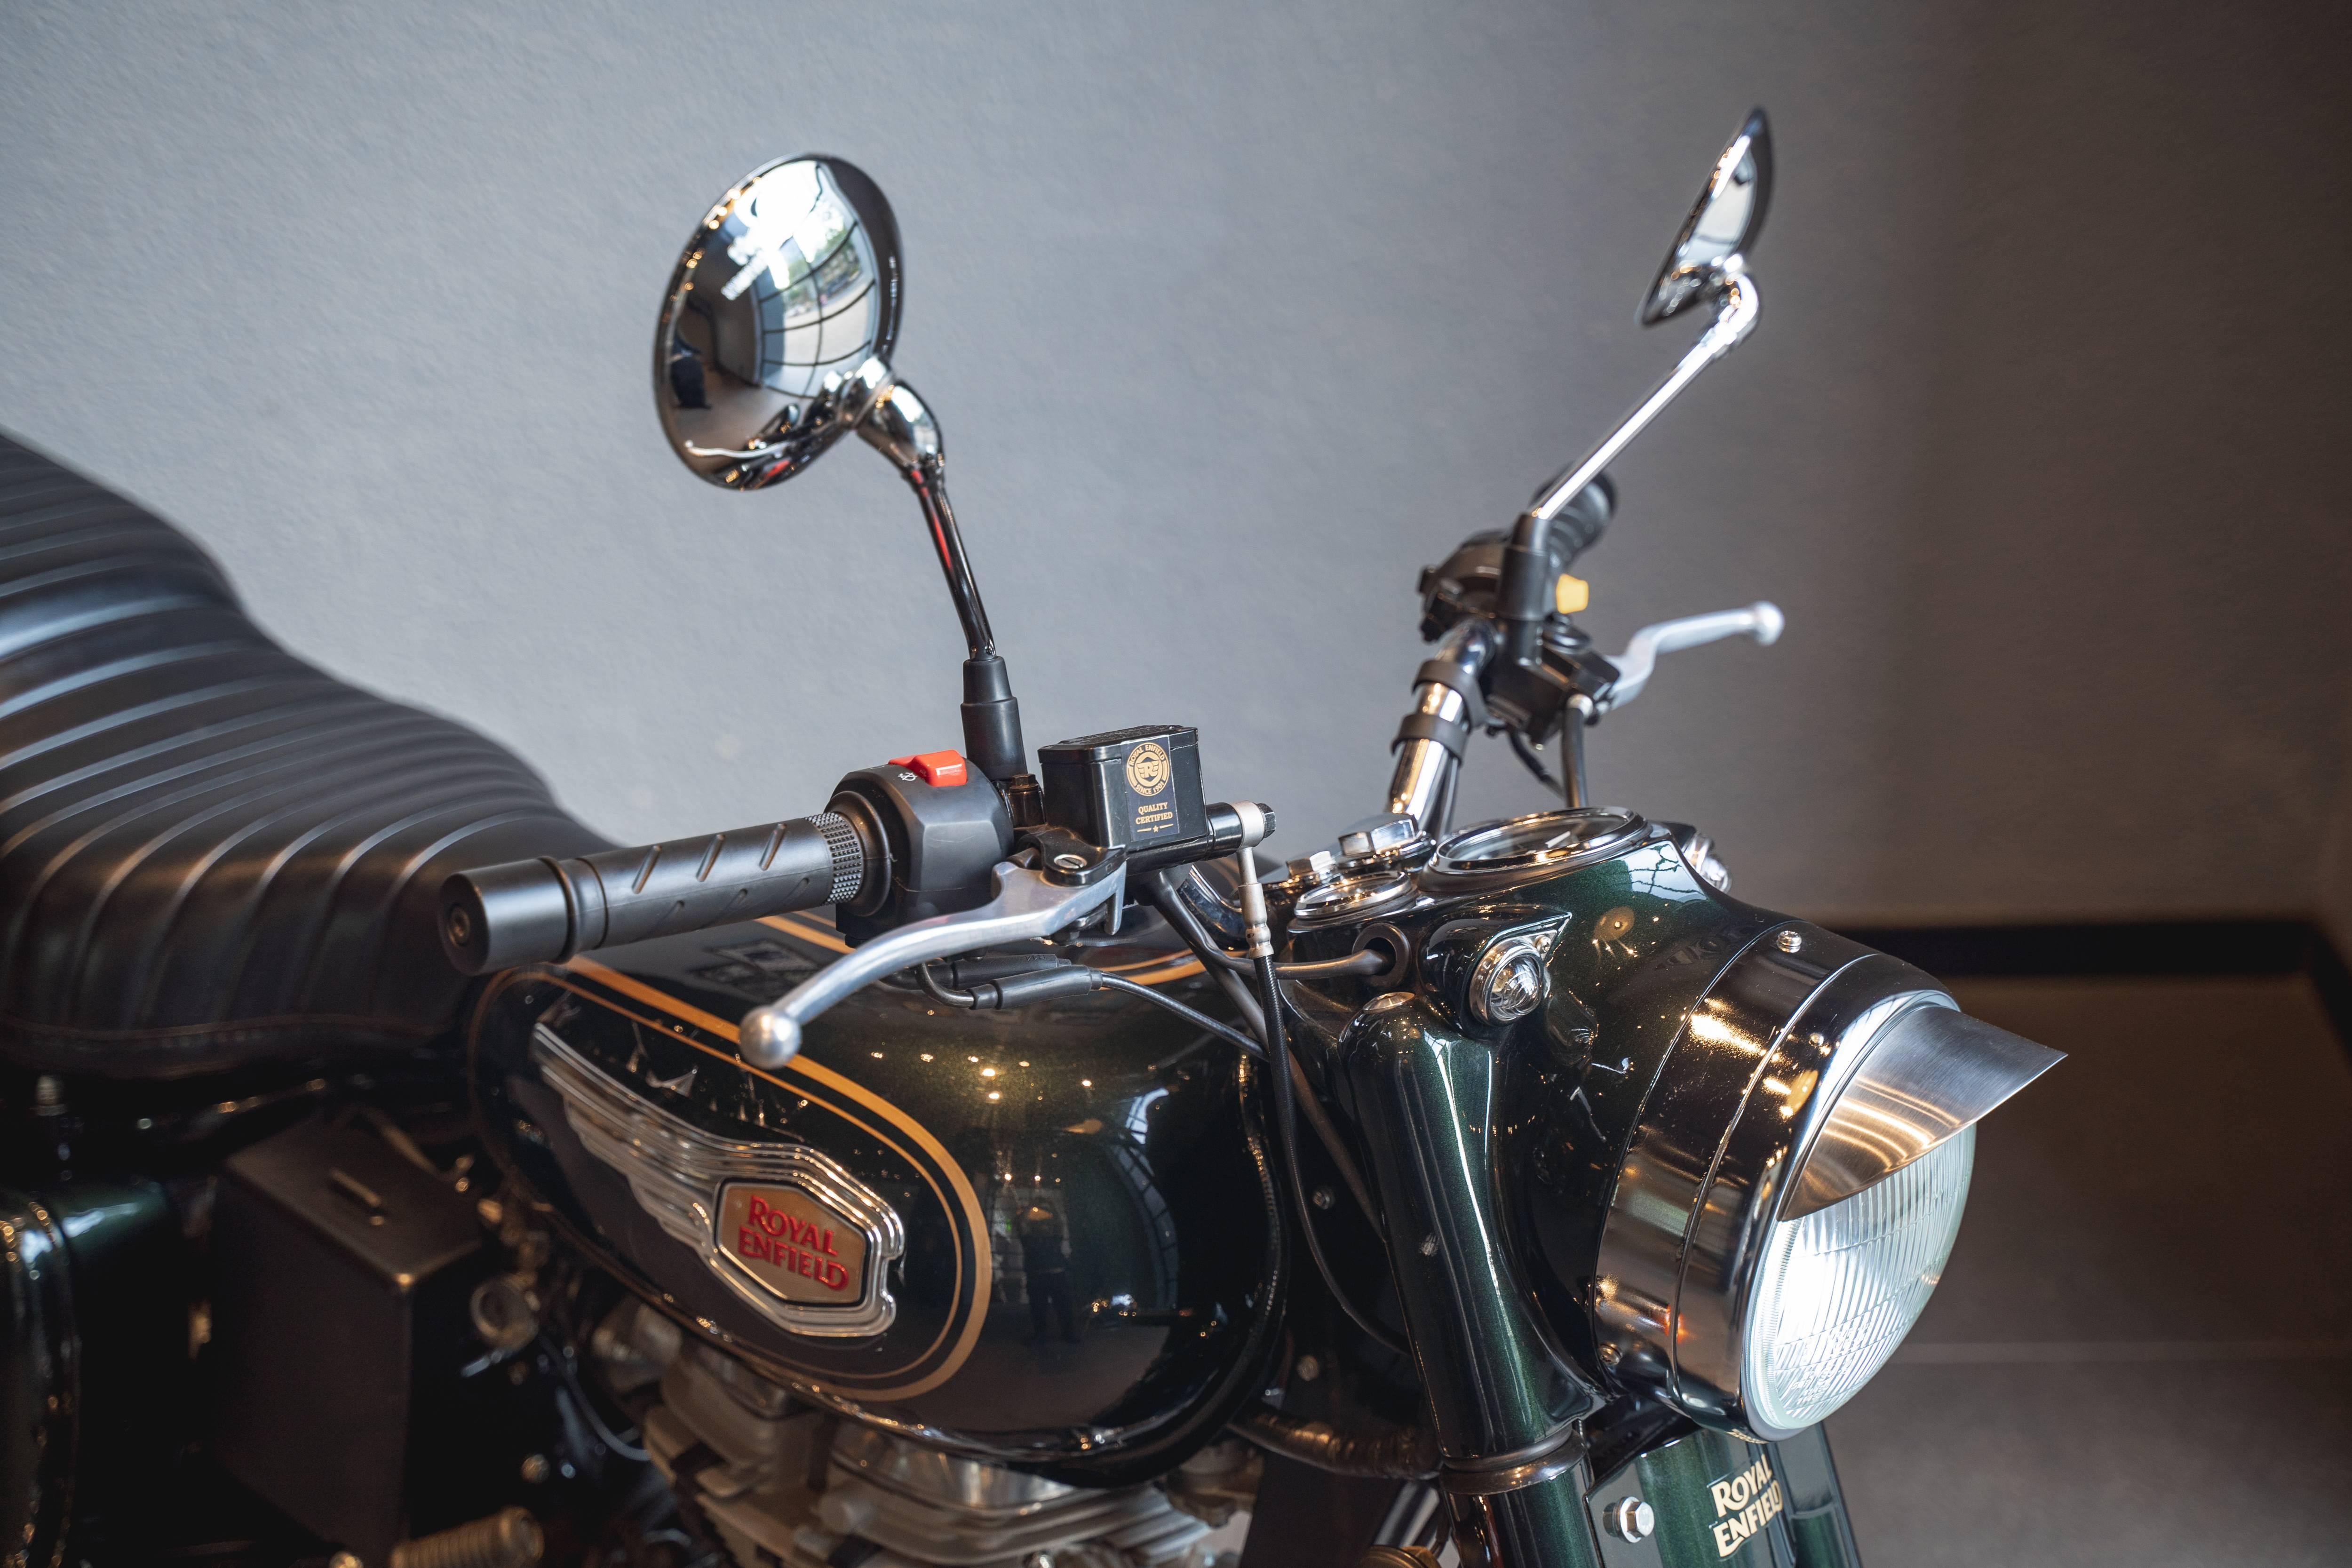 moto 500 cc anh 5